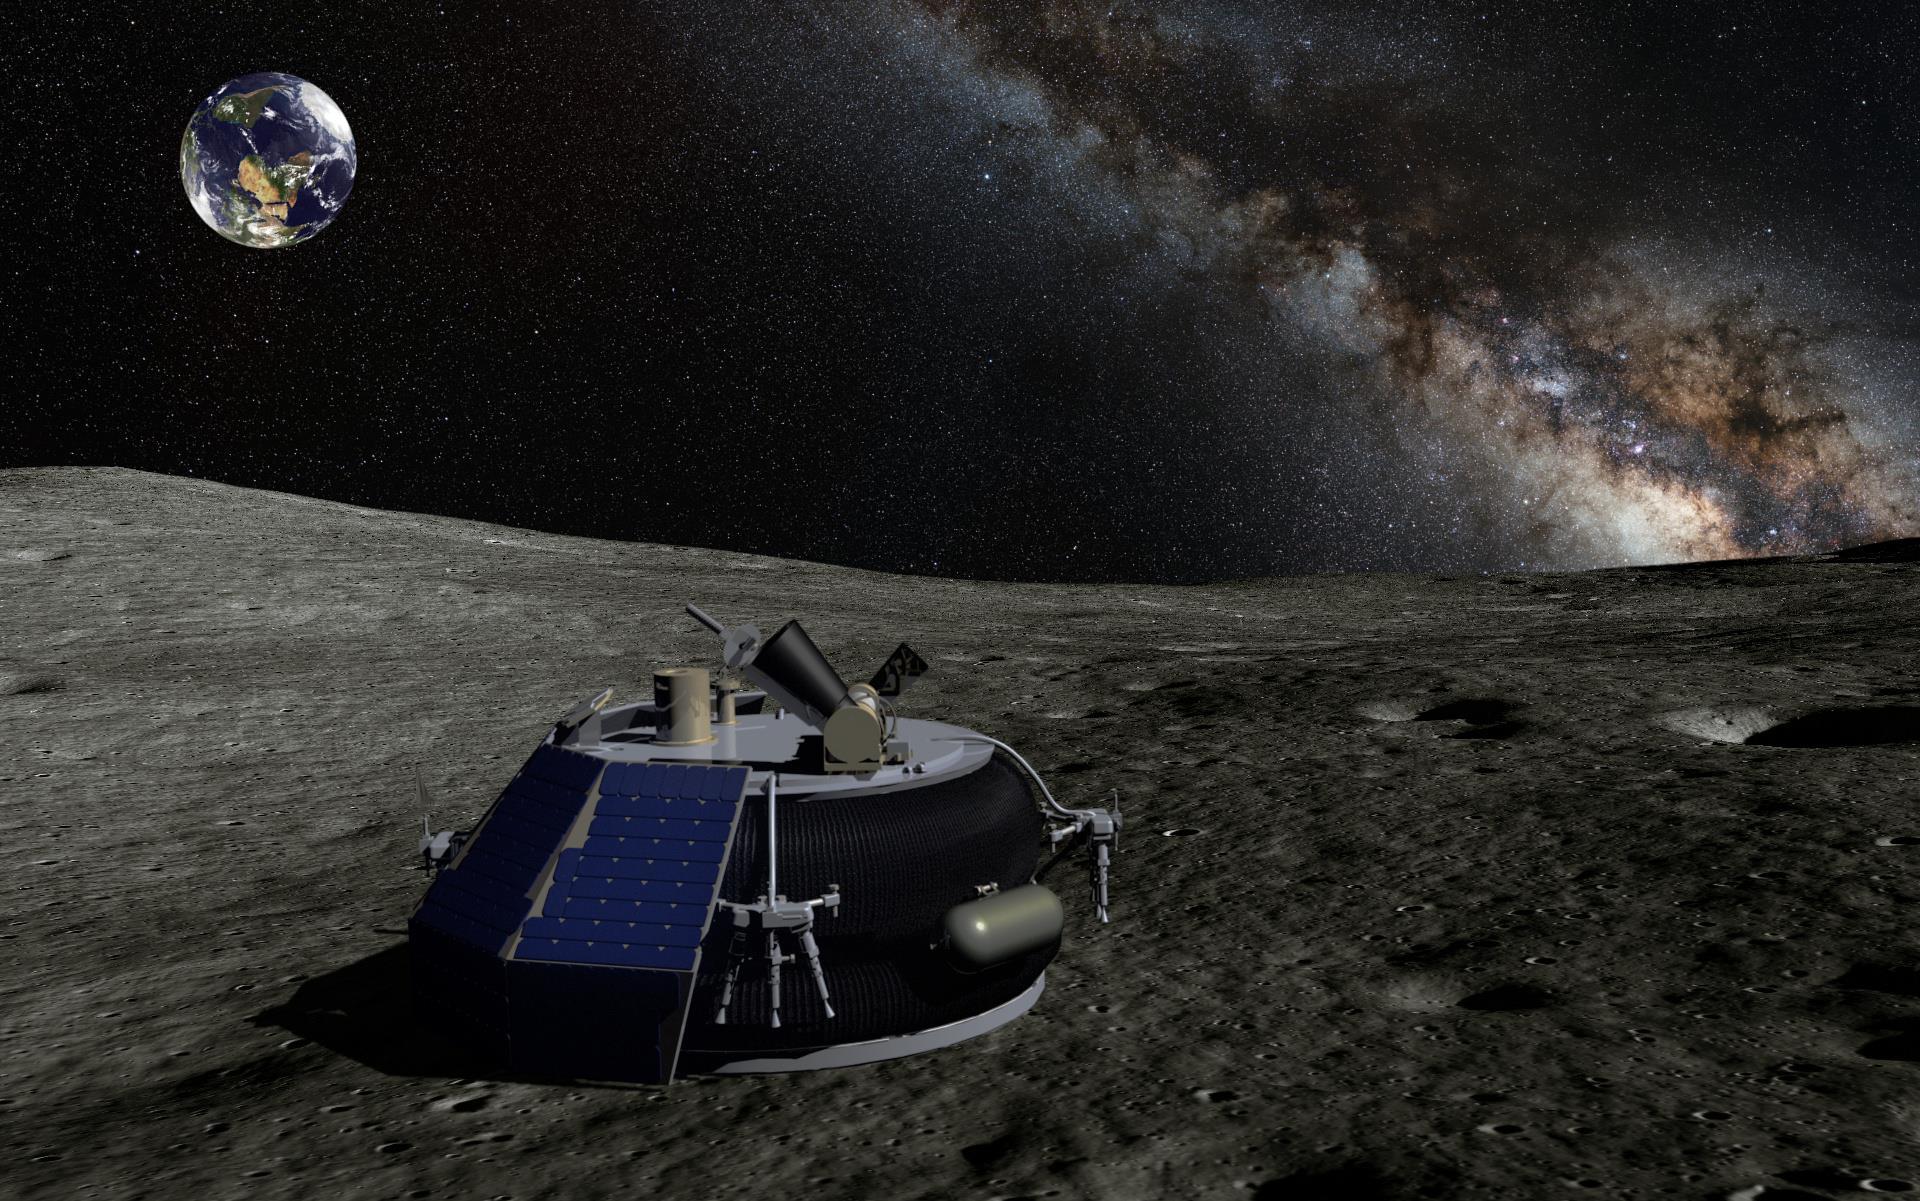 Courtesy of Moon Express, Google Lunar XPRIZE